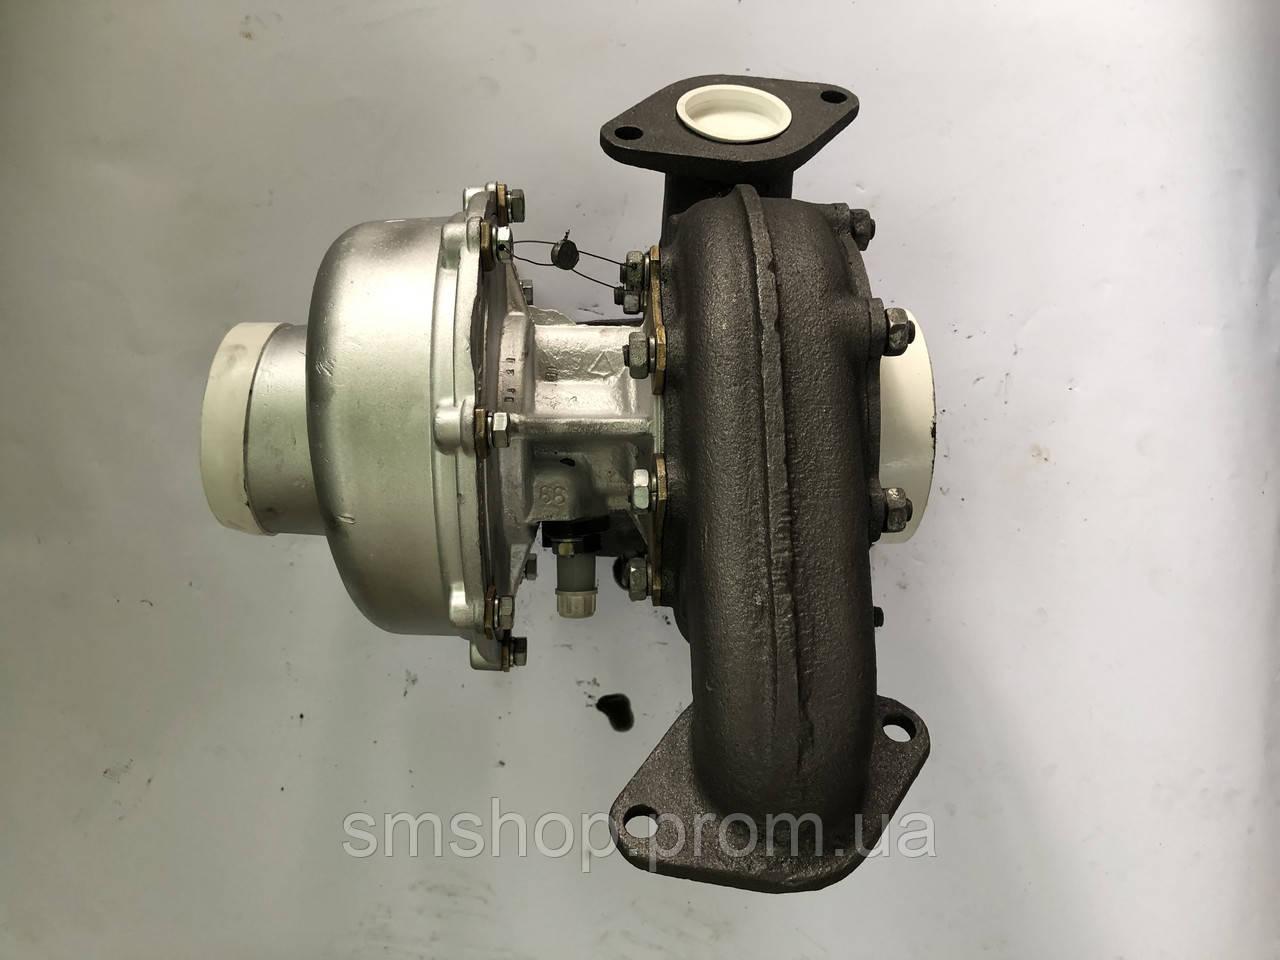 Турбокомпрессор (турбина) ТКР-11Н-1 (Т-150)